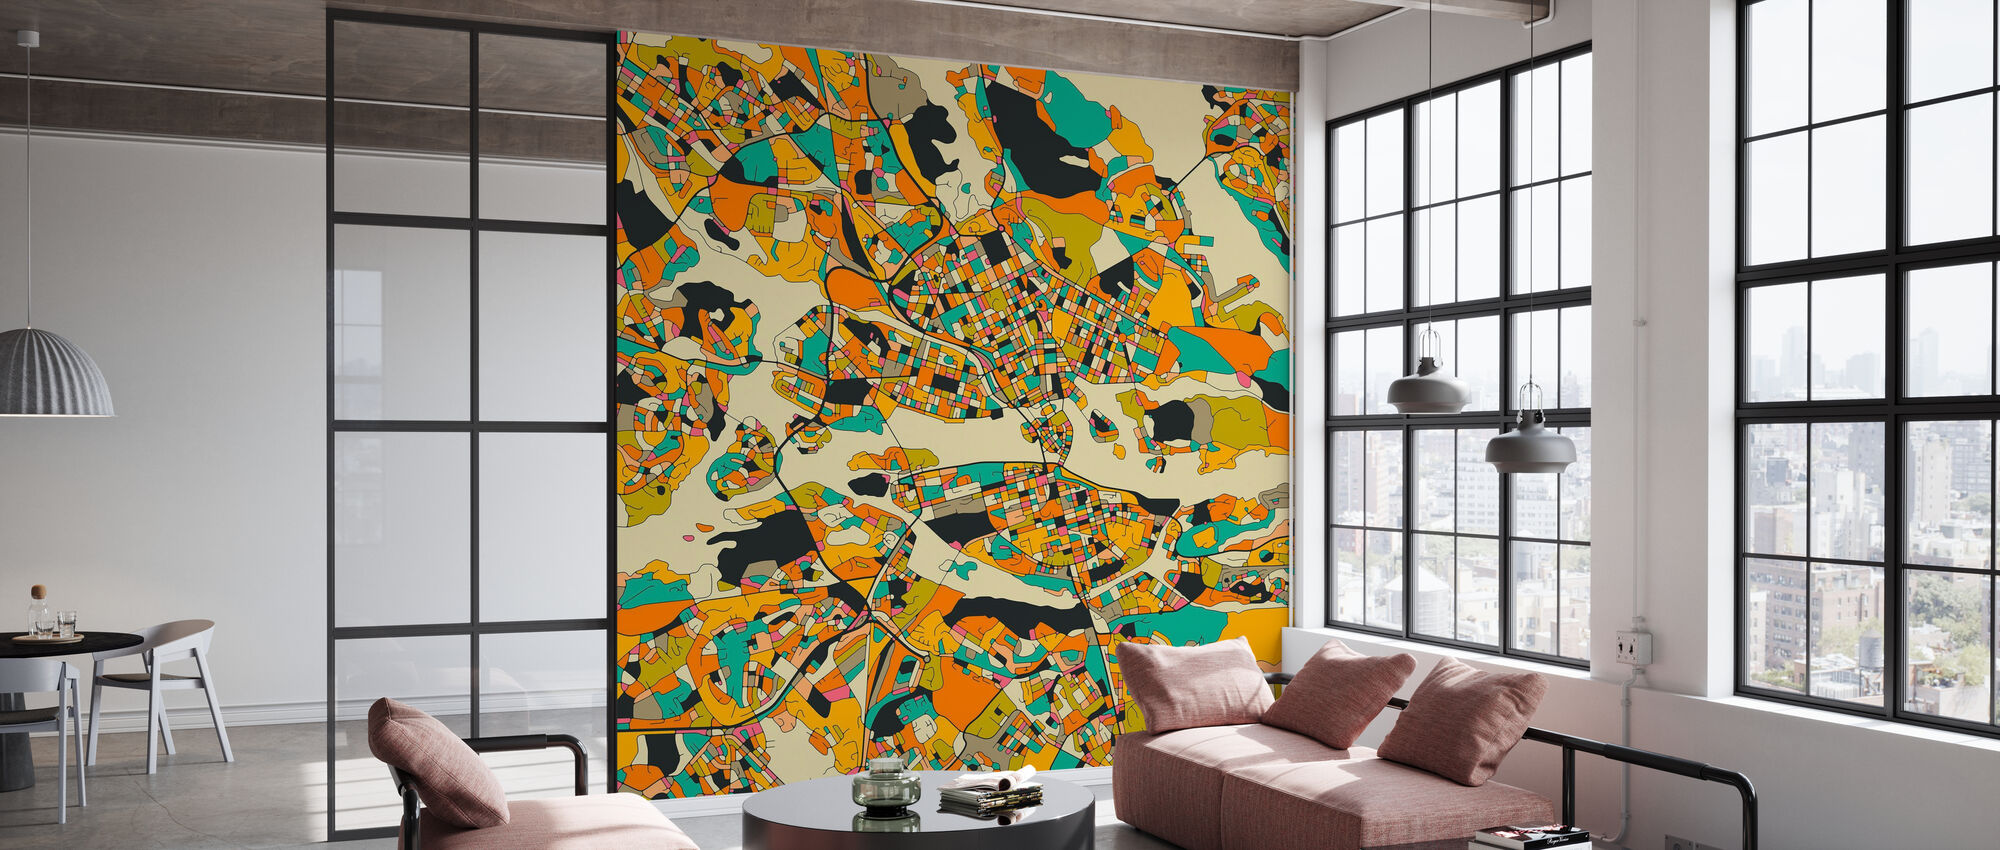 Orange Map - Stockholm - Wallpaper - Office